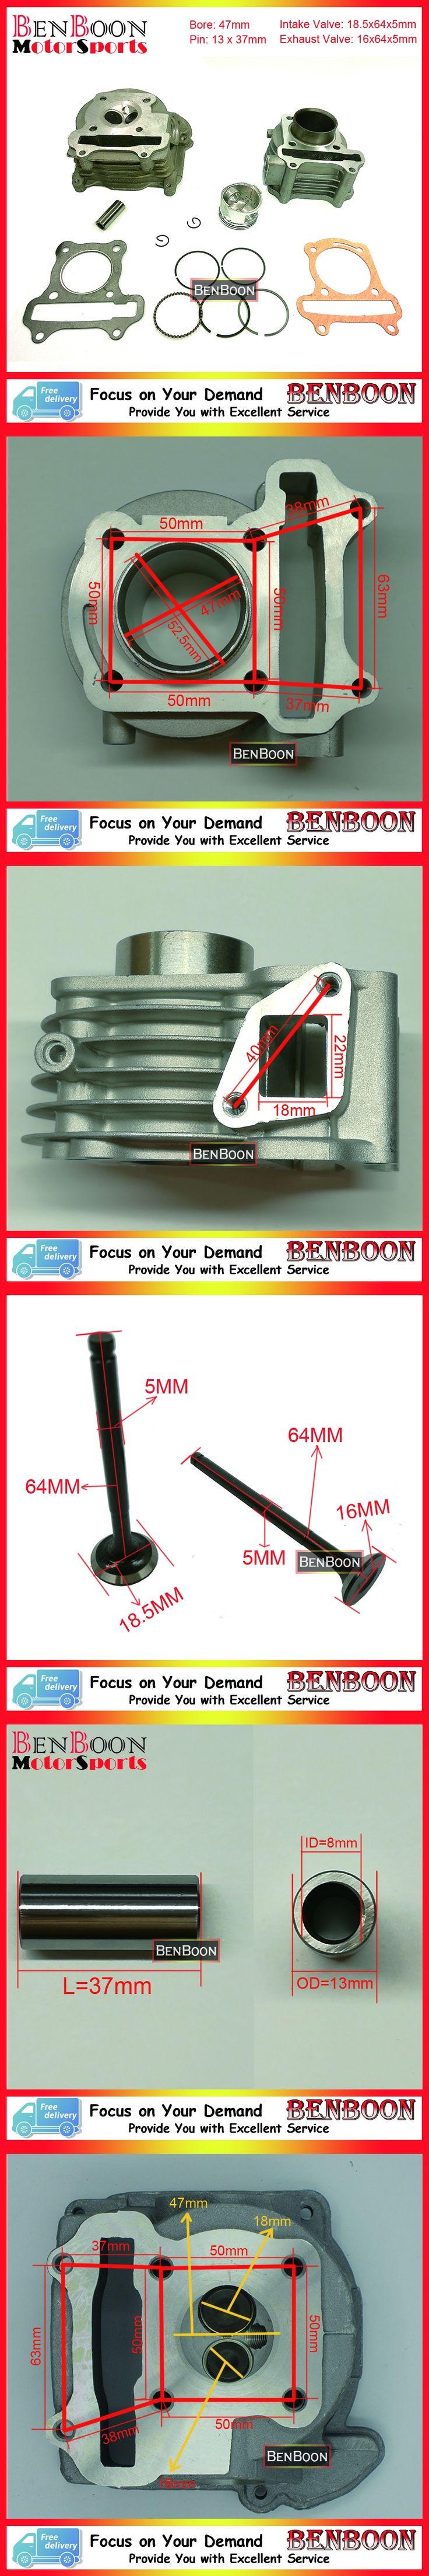 GY6 80cc 47mm Cylinder & Head Kit for 4T 139QMB Engine Scooter Parts ATV Parts Roketa, Taotao, Baotian, Znen, Free Shipping